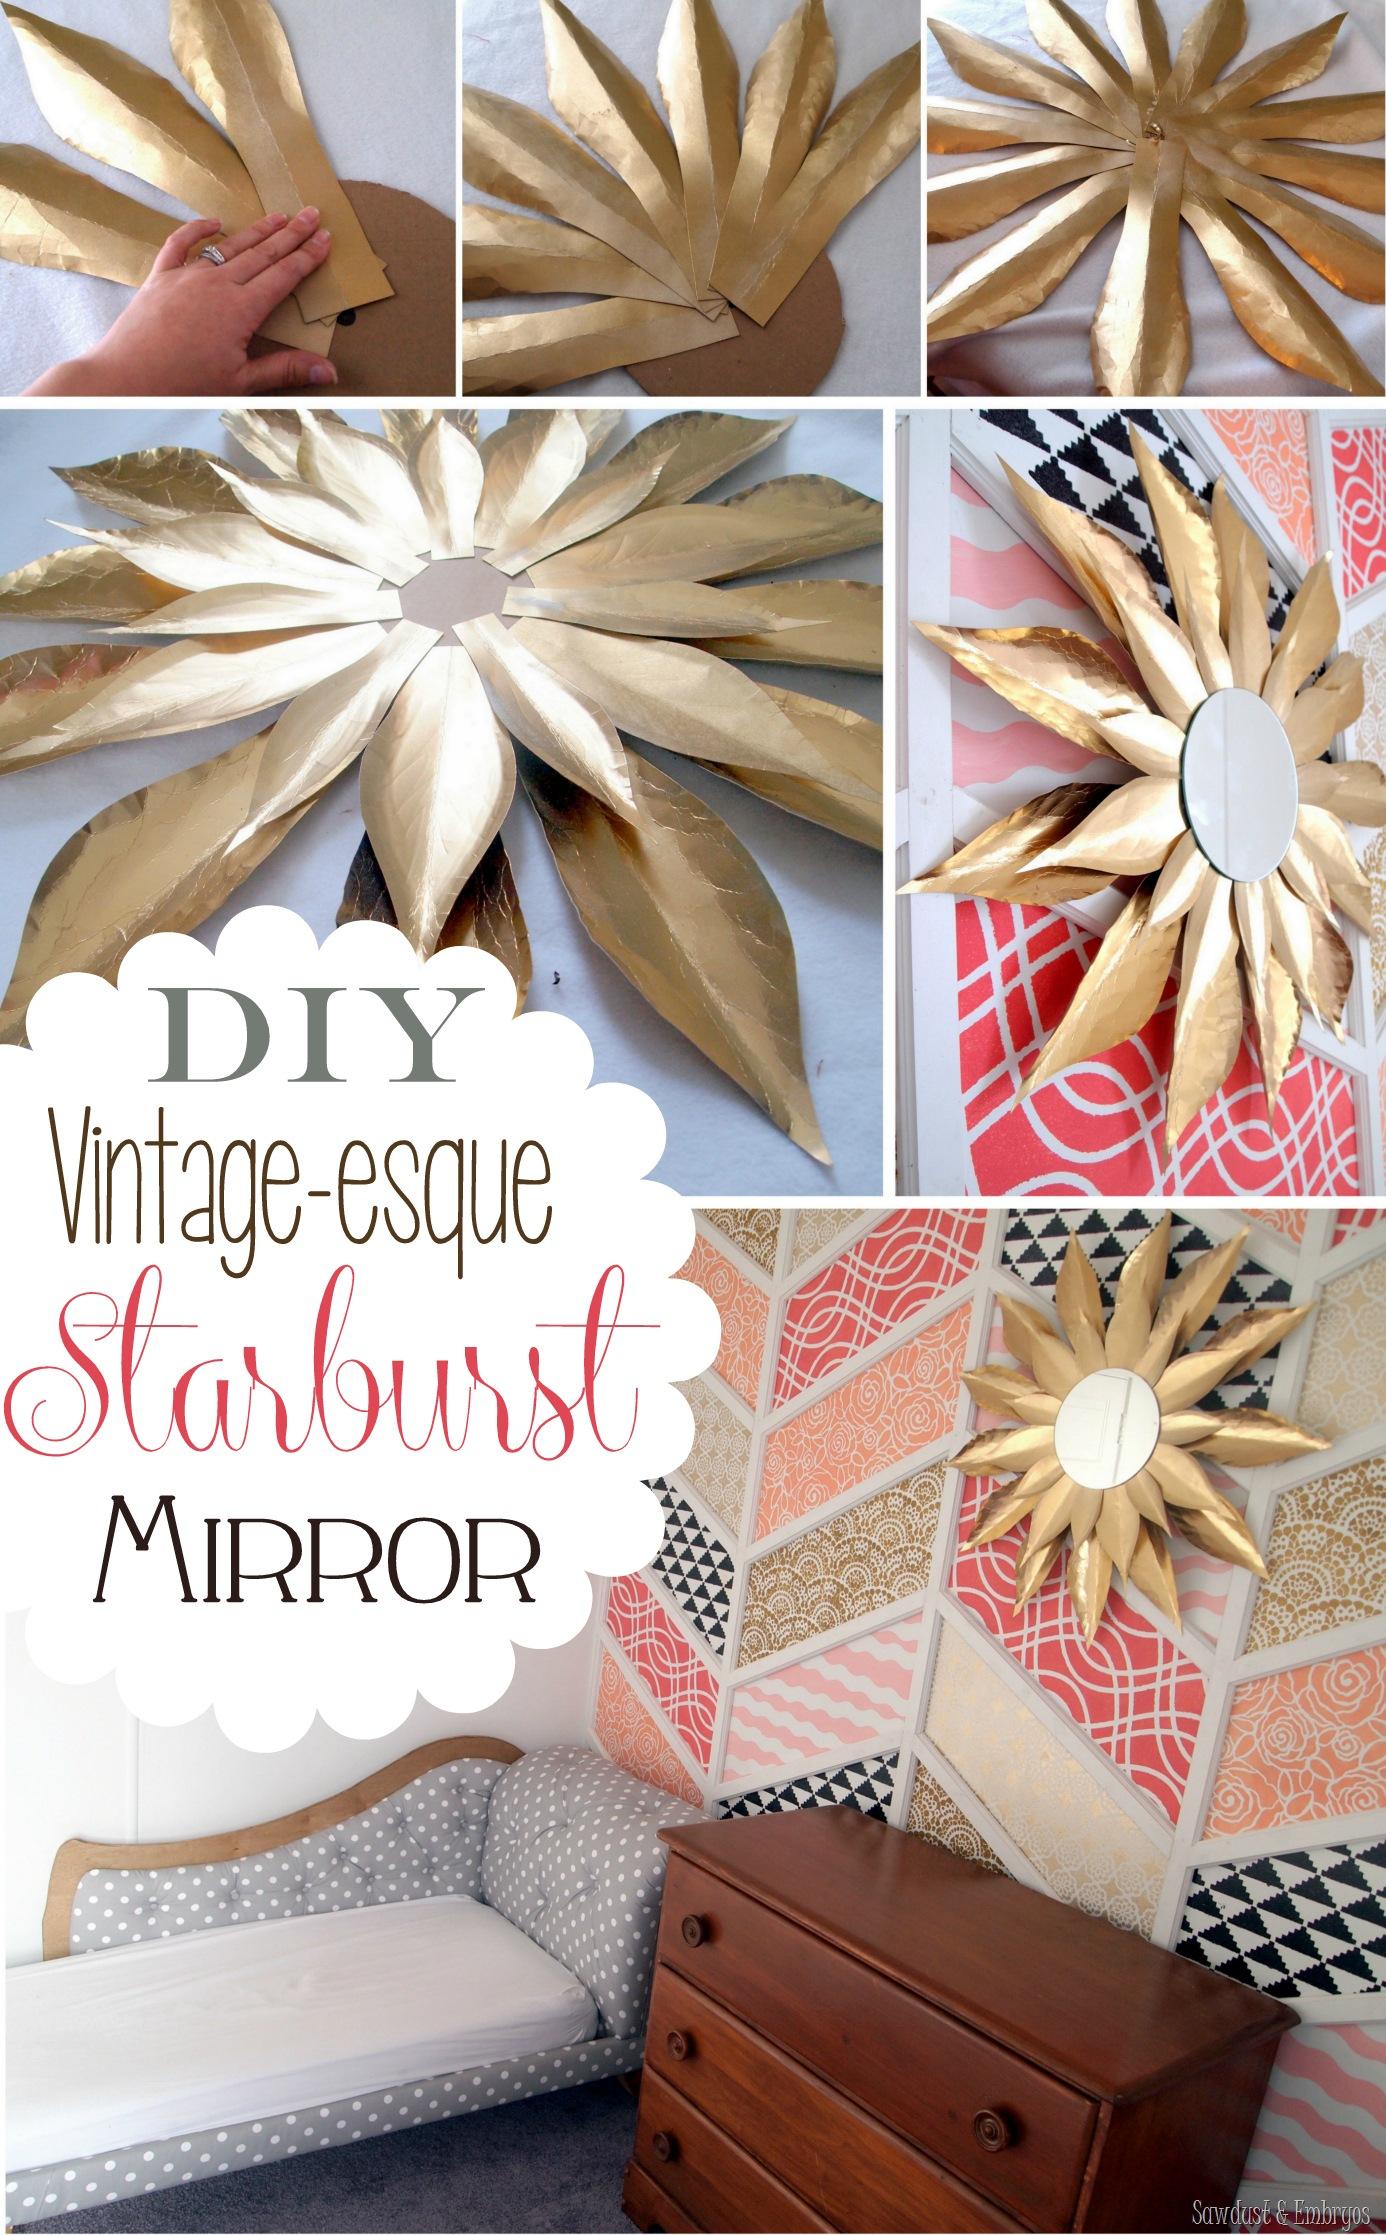 How to make a Vintage-esque DIY Starburst Mirror!